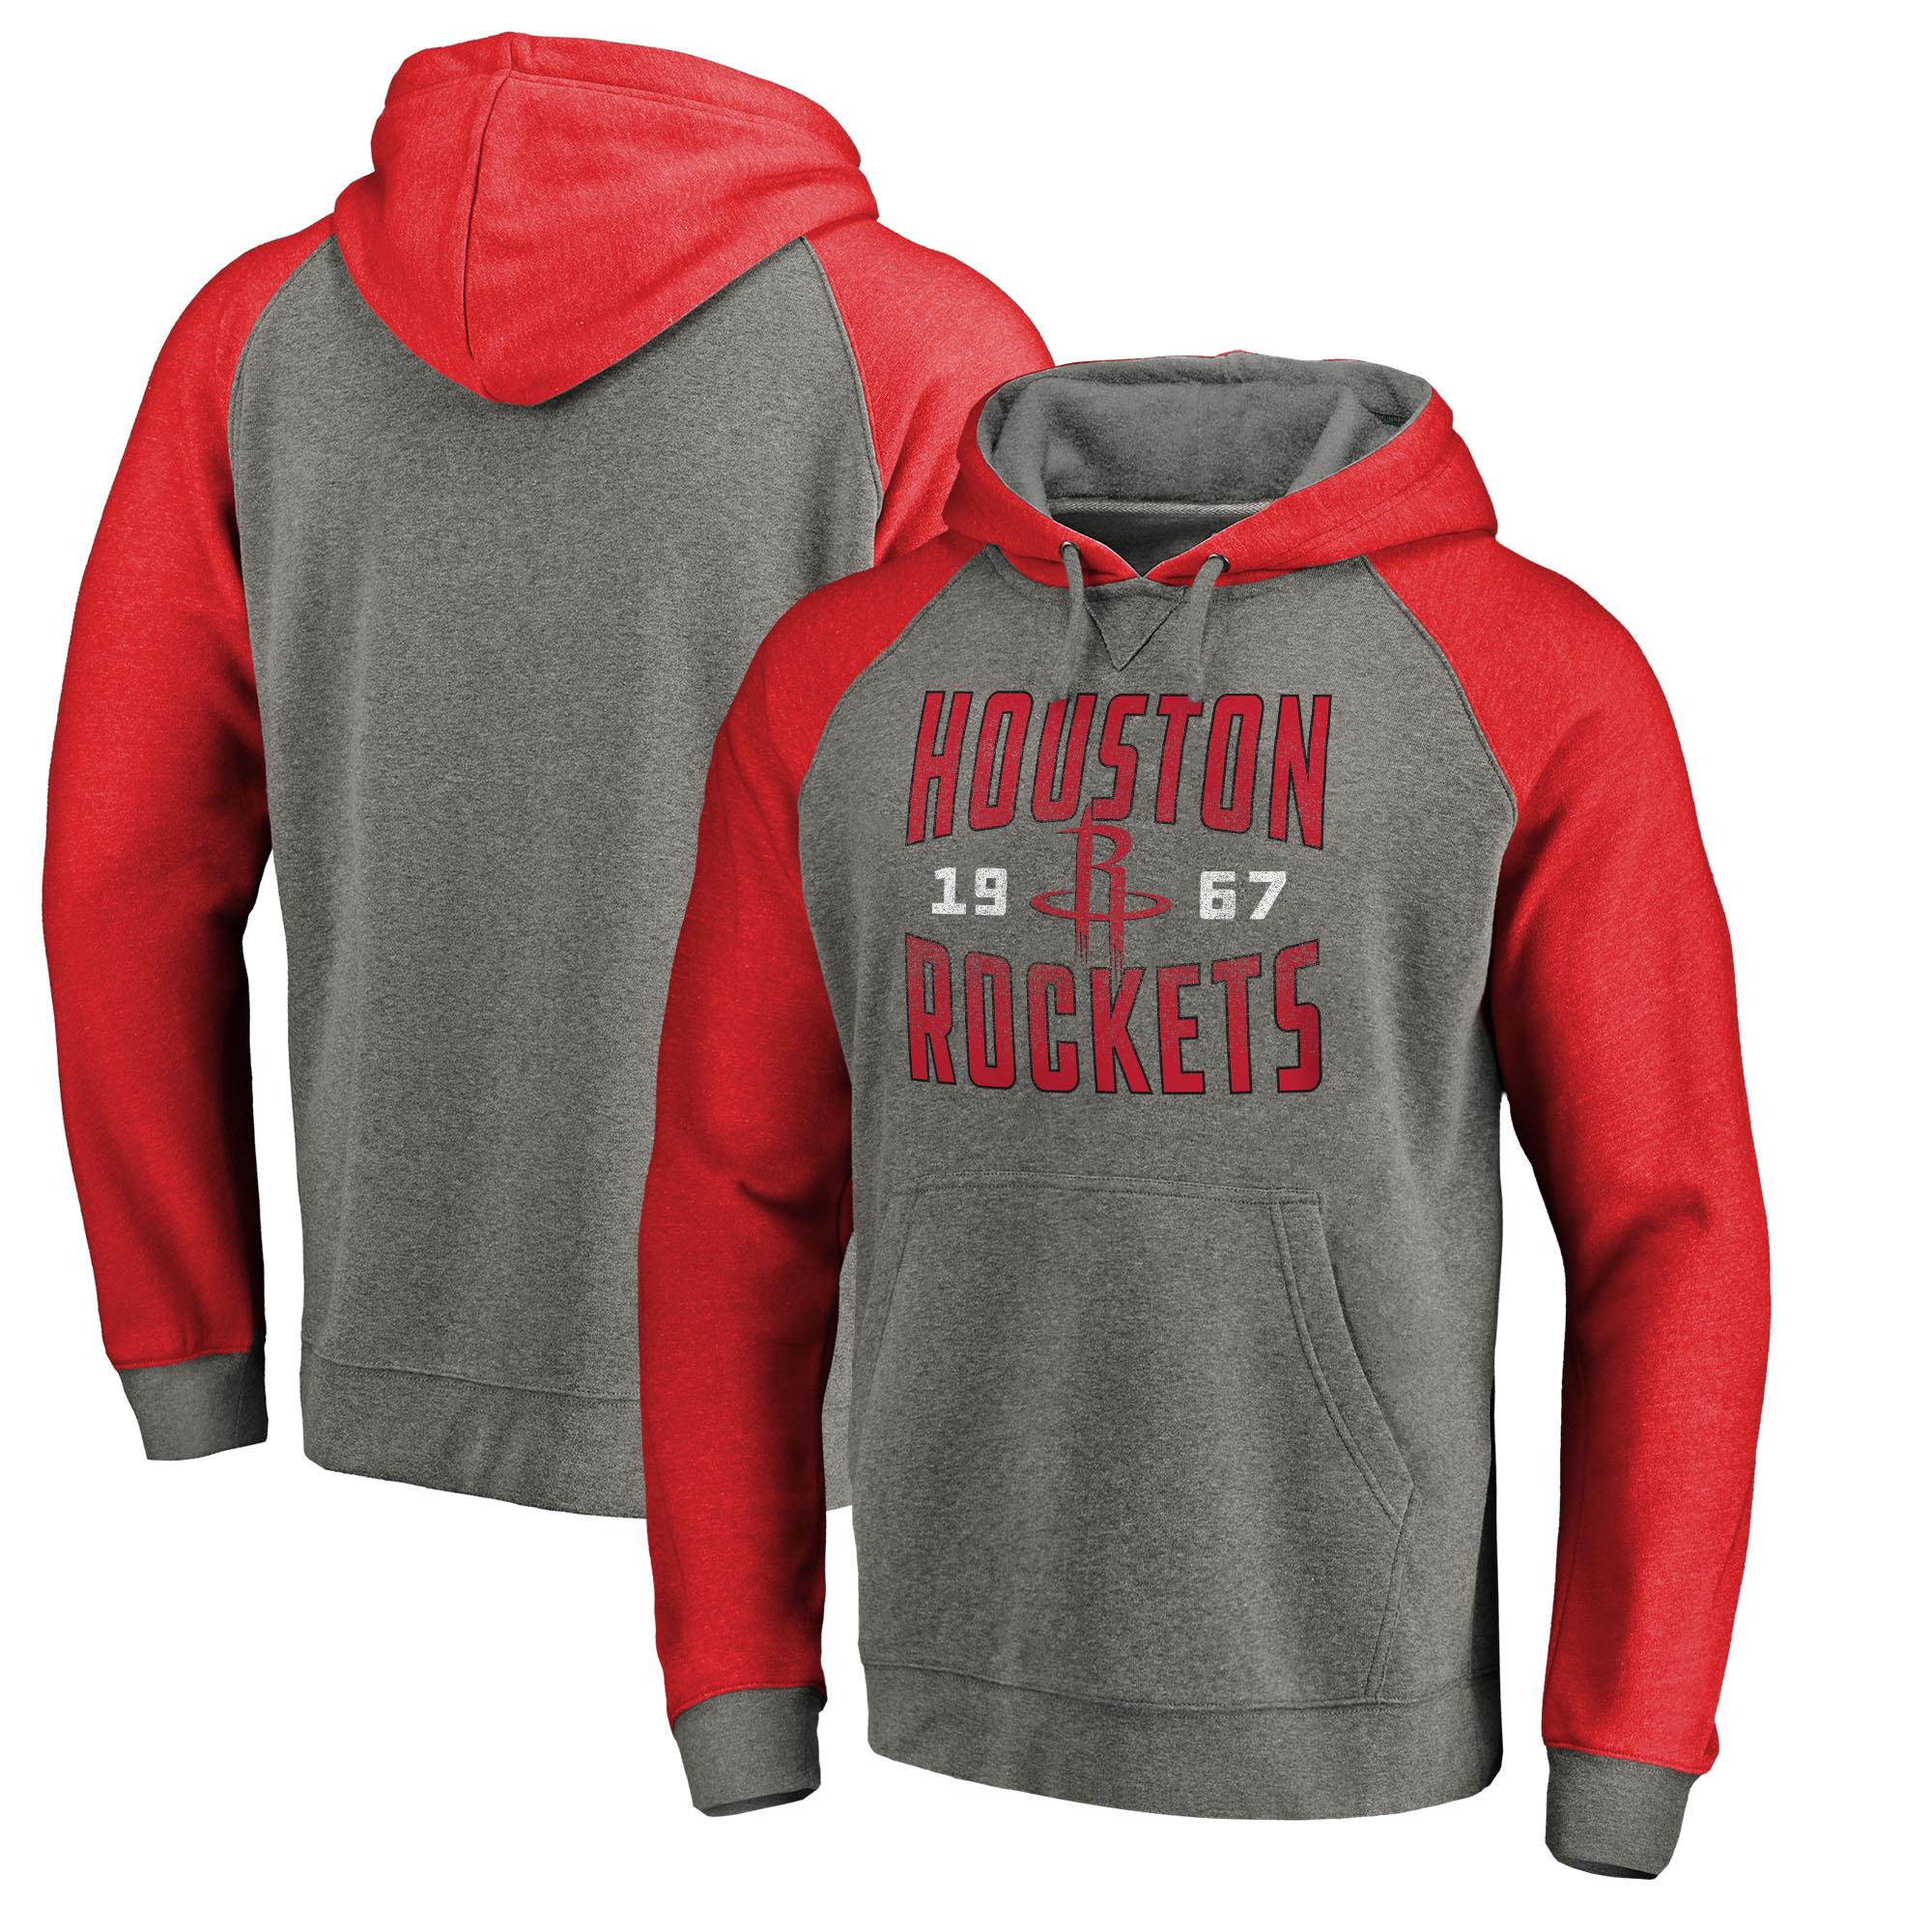 Houston Rockets Fanatics Branded Antique Stack Big & Tall Tri-Blend Raglan Pullover Hoodie - Ash